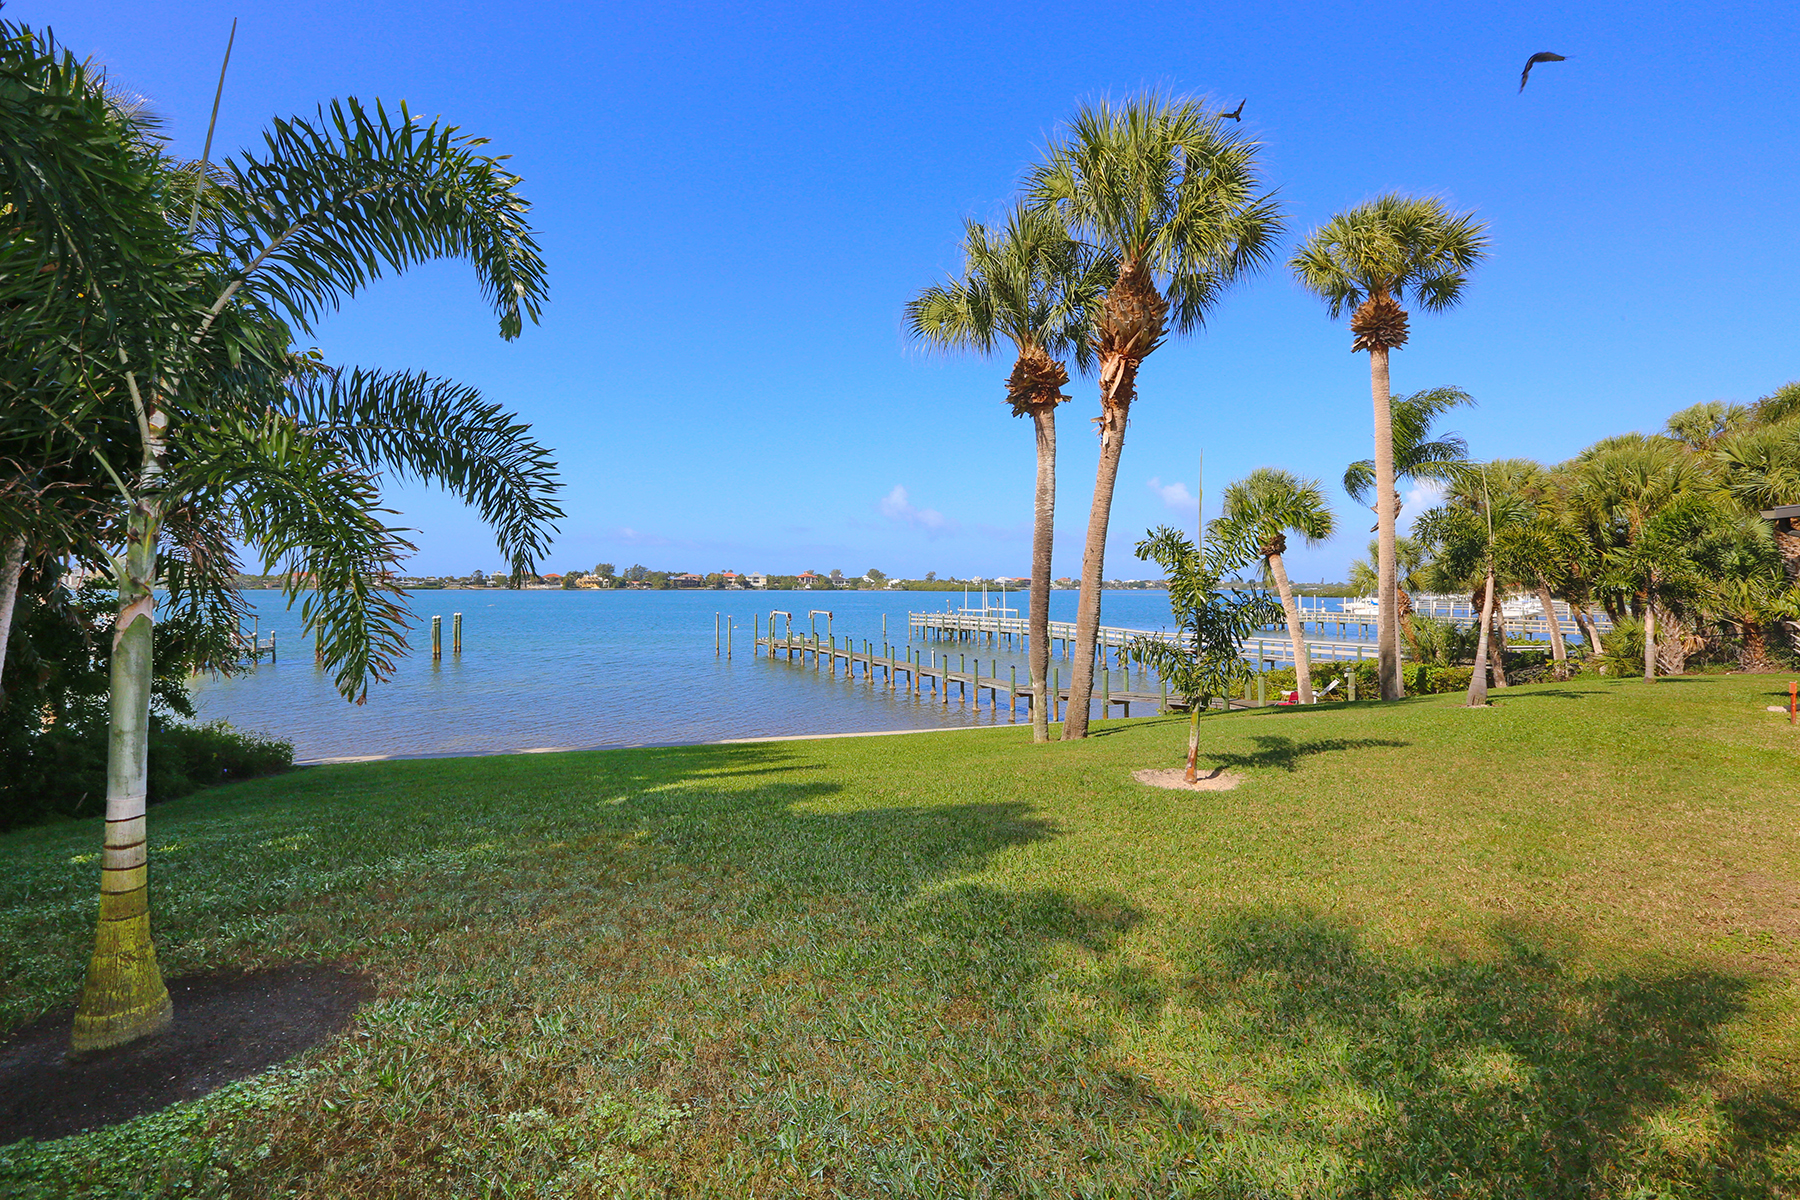 Terreno para Venda às NOKOMIS 1725 Melody Ln 1 Nokomis, Florida, 34275 Estados Unidos